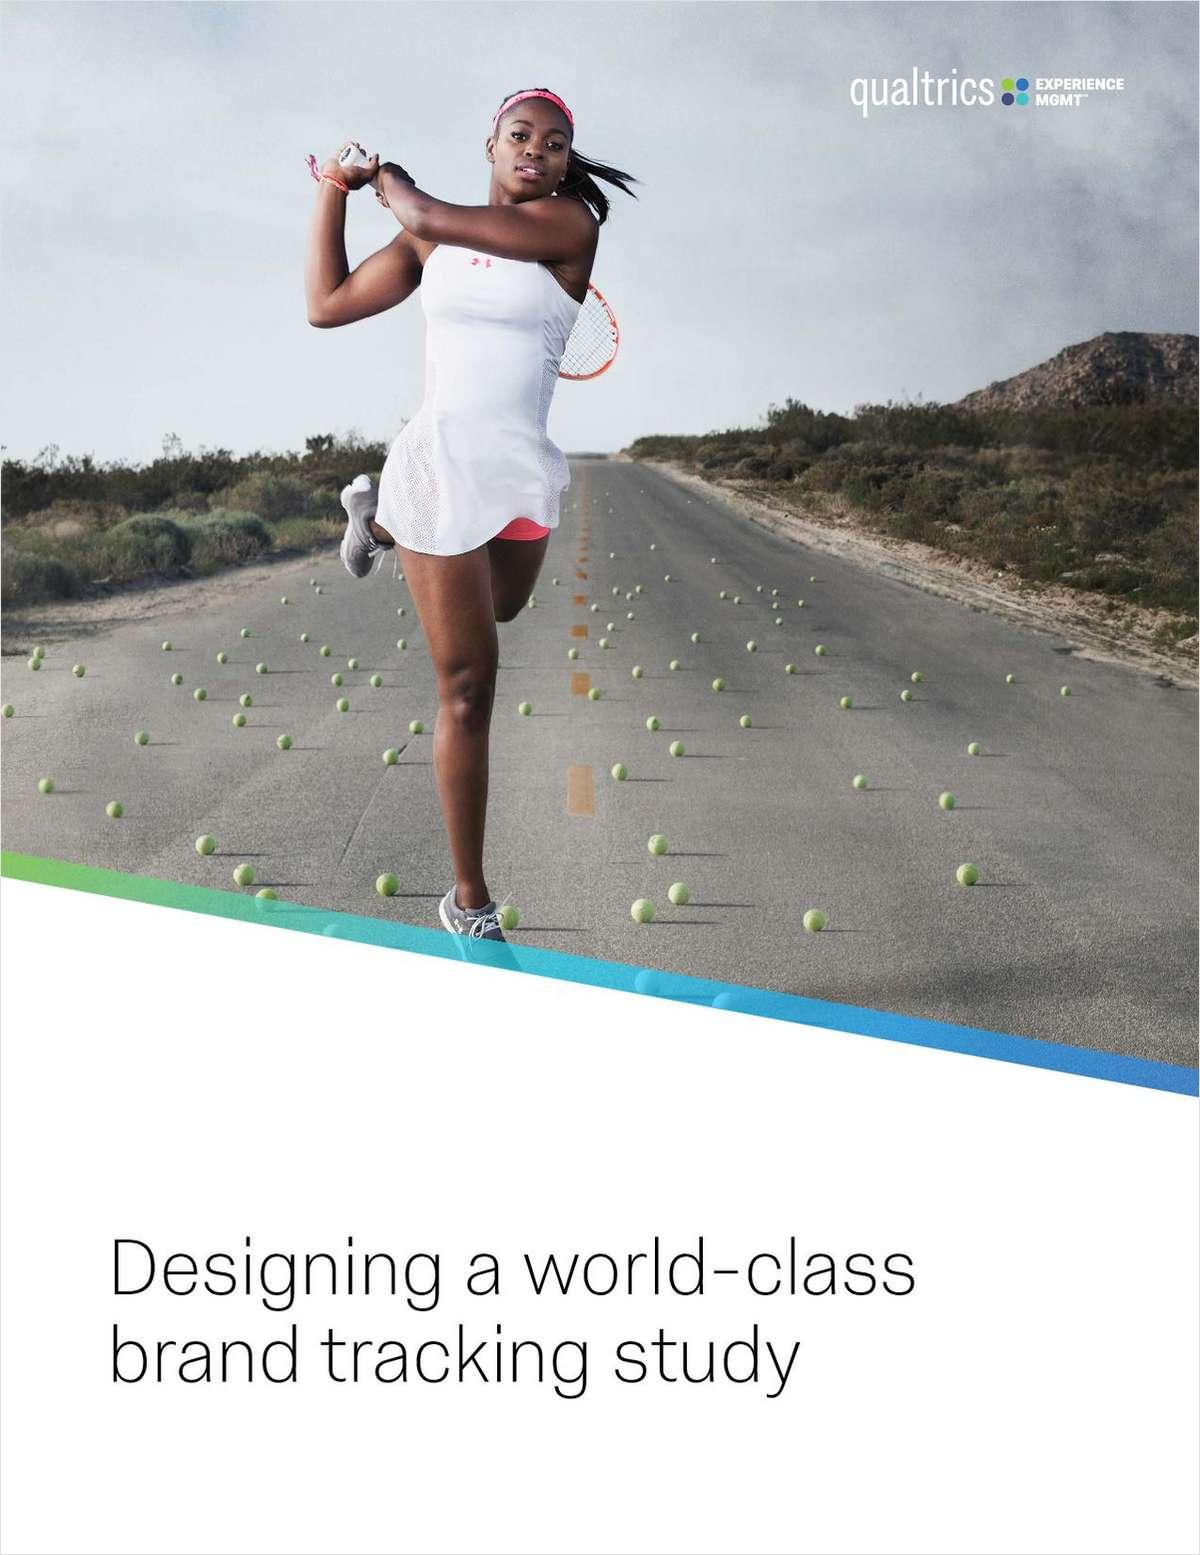 Designing a World-Class Brand Tracking Study